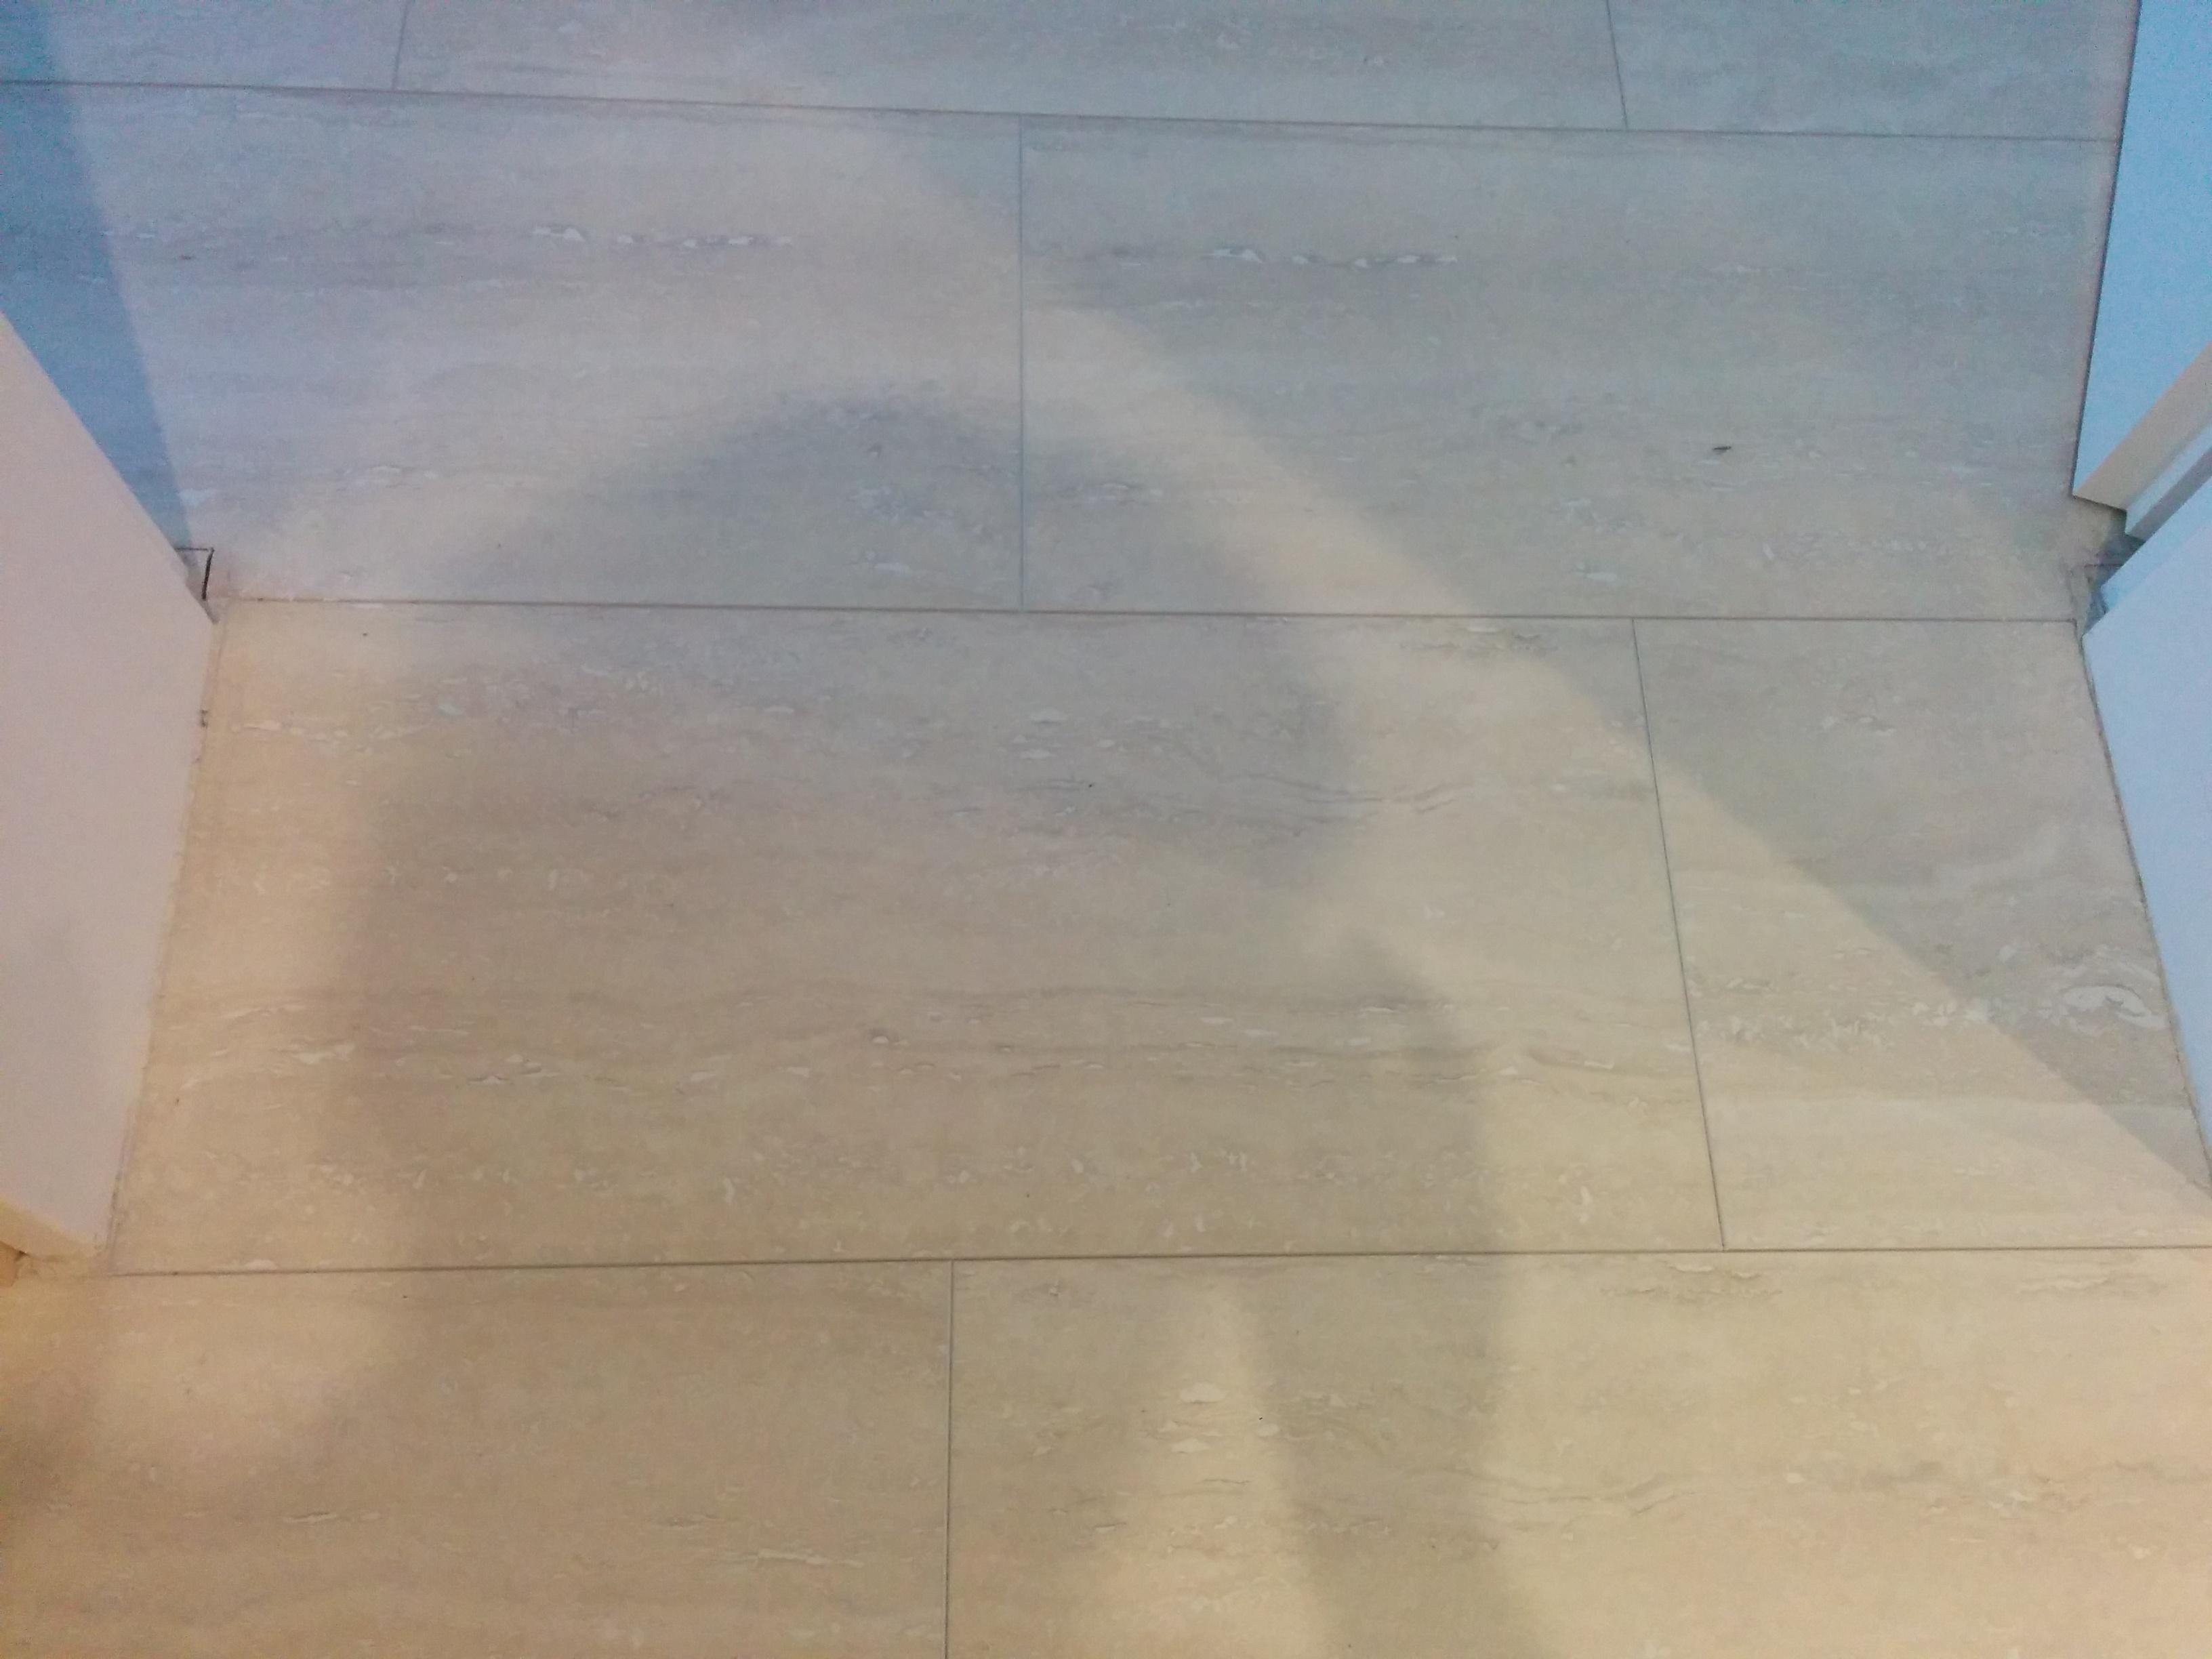 Fußboden Quietscht Was Tun ~ Laminat quietscht hilfe wohnzimmer